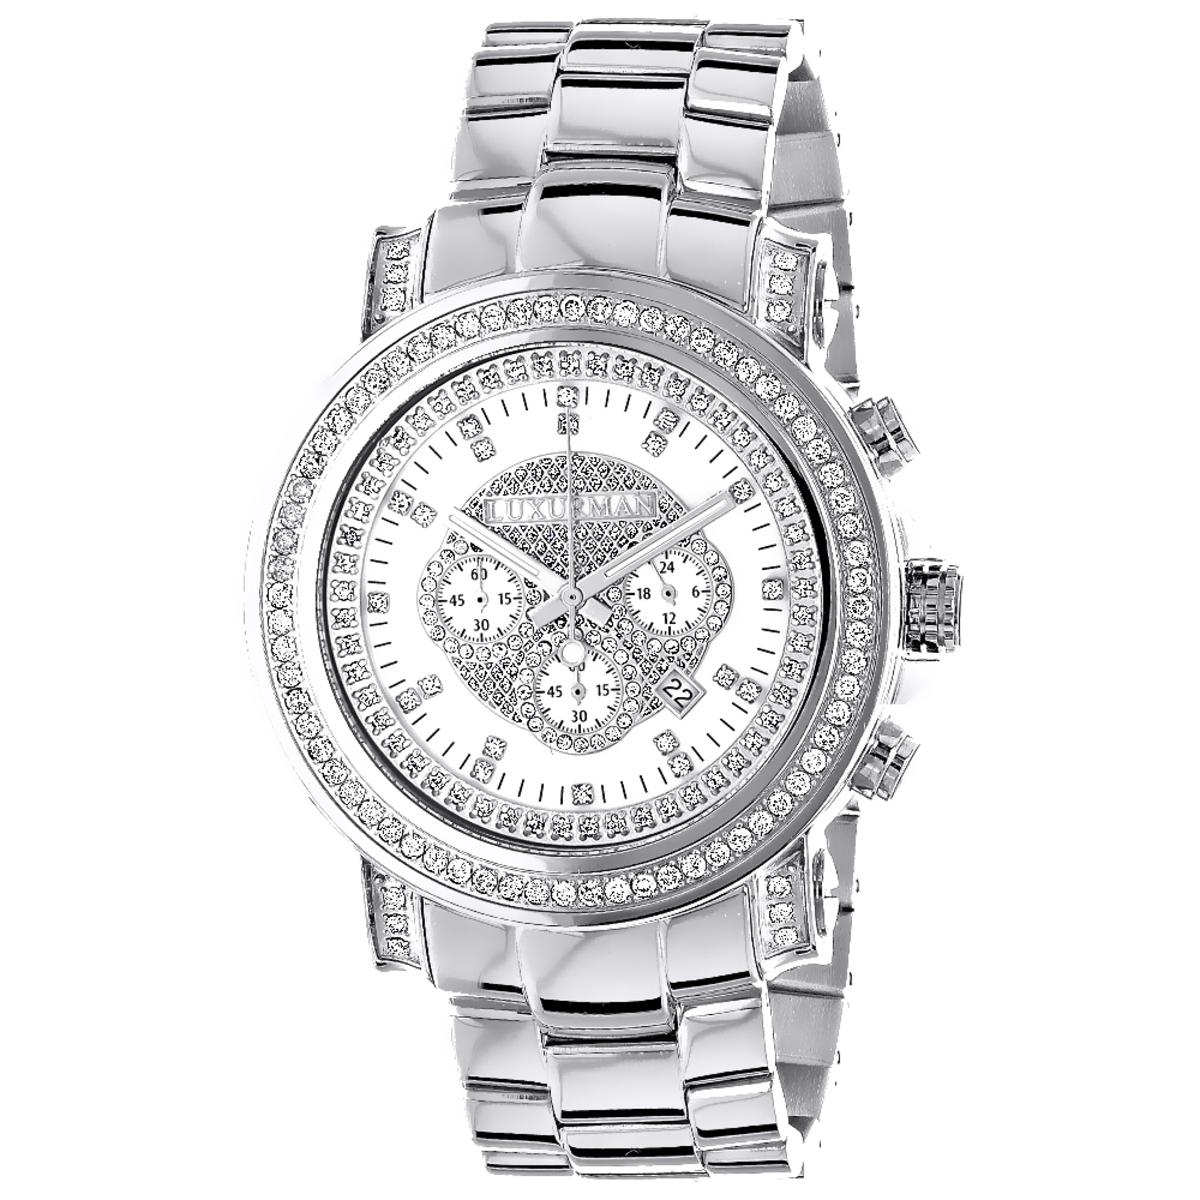 Oversized Luxurman Mens Diamond Watch 2.5ct Chronograph Gold Plated